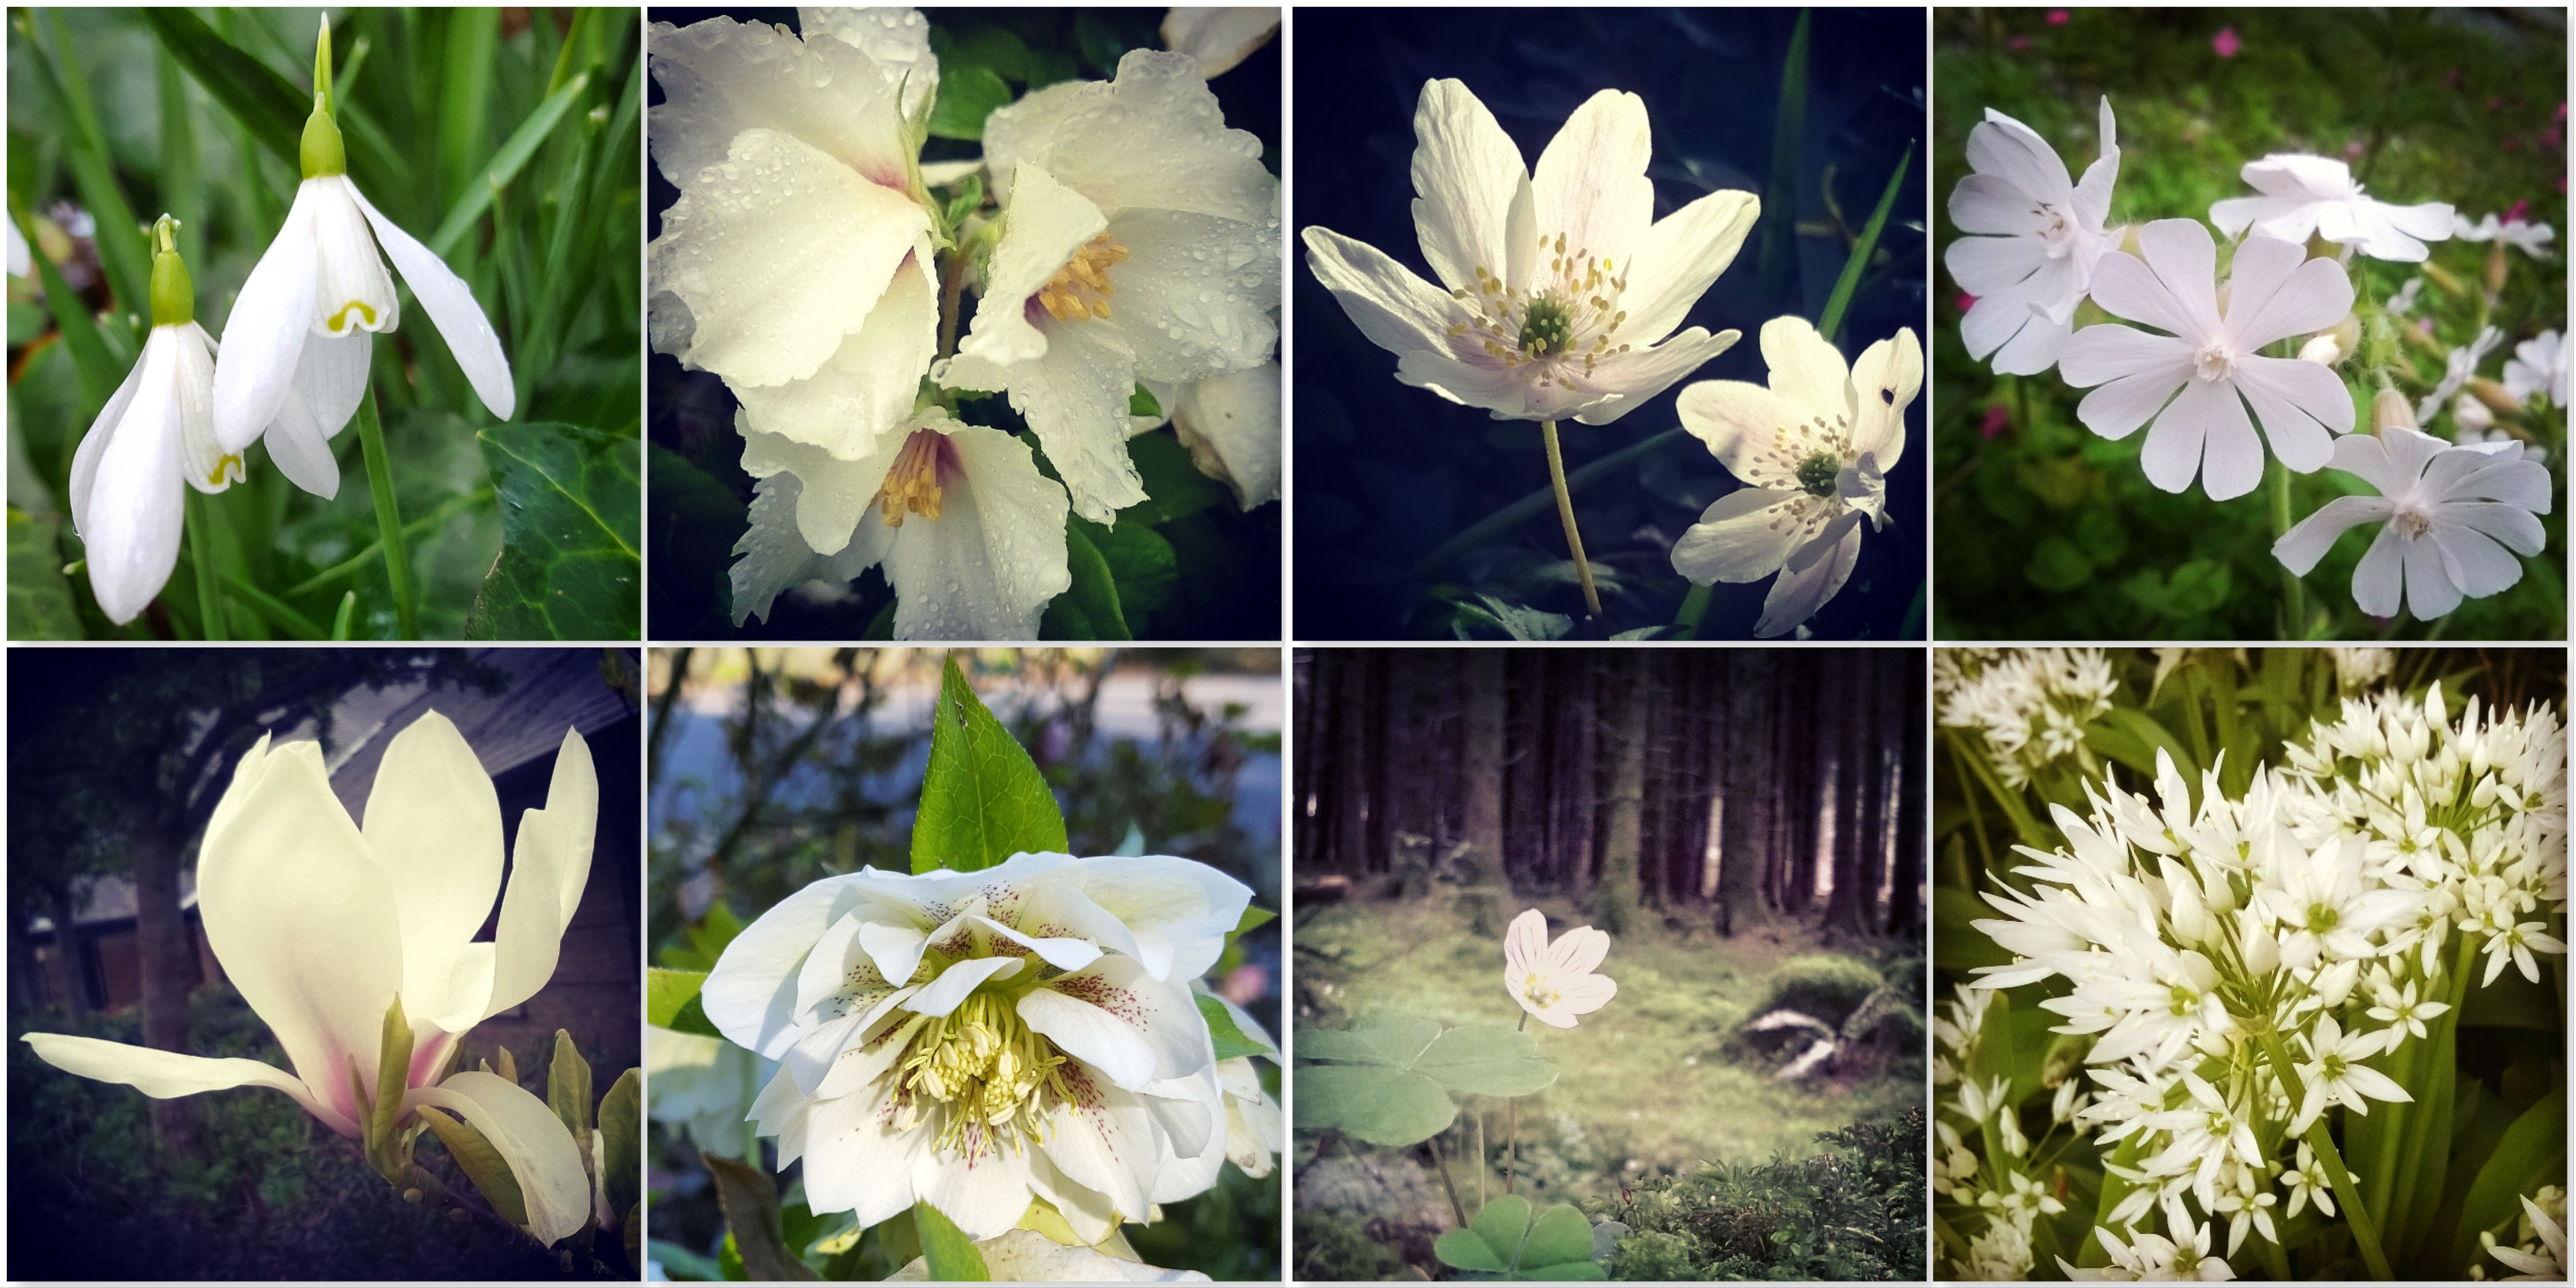 Snowdrops - Belle Etoile - Wild Anemone - White Campion - Magnolia - Hellebore - Oxalis - Wild Garlic